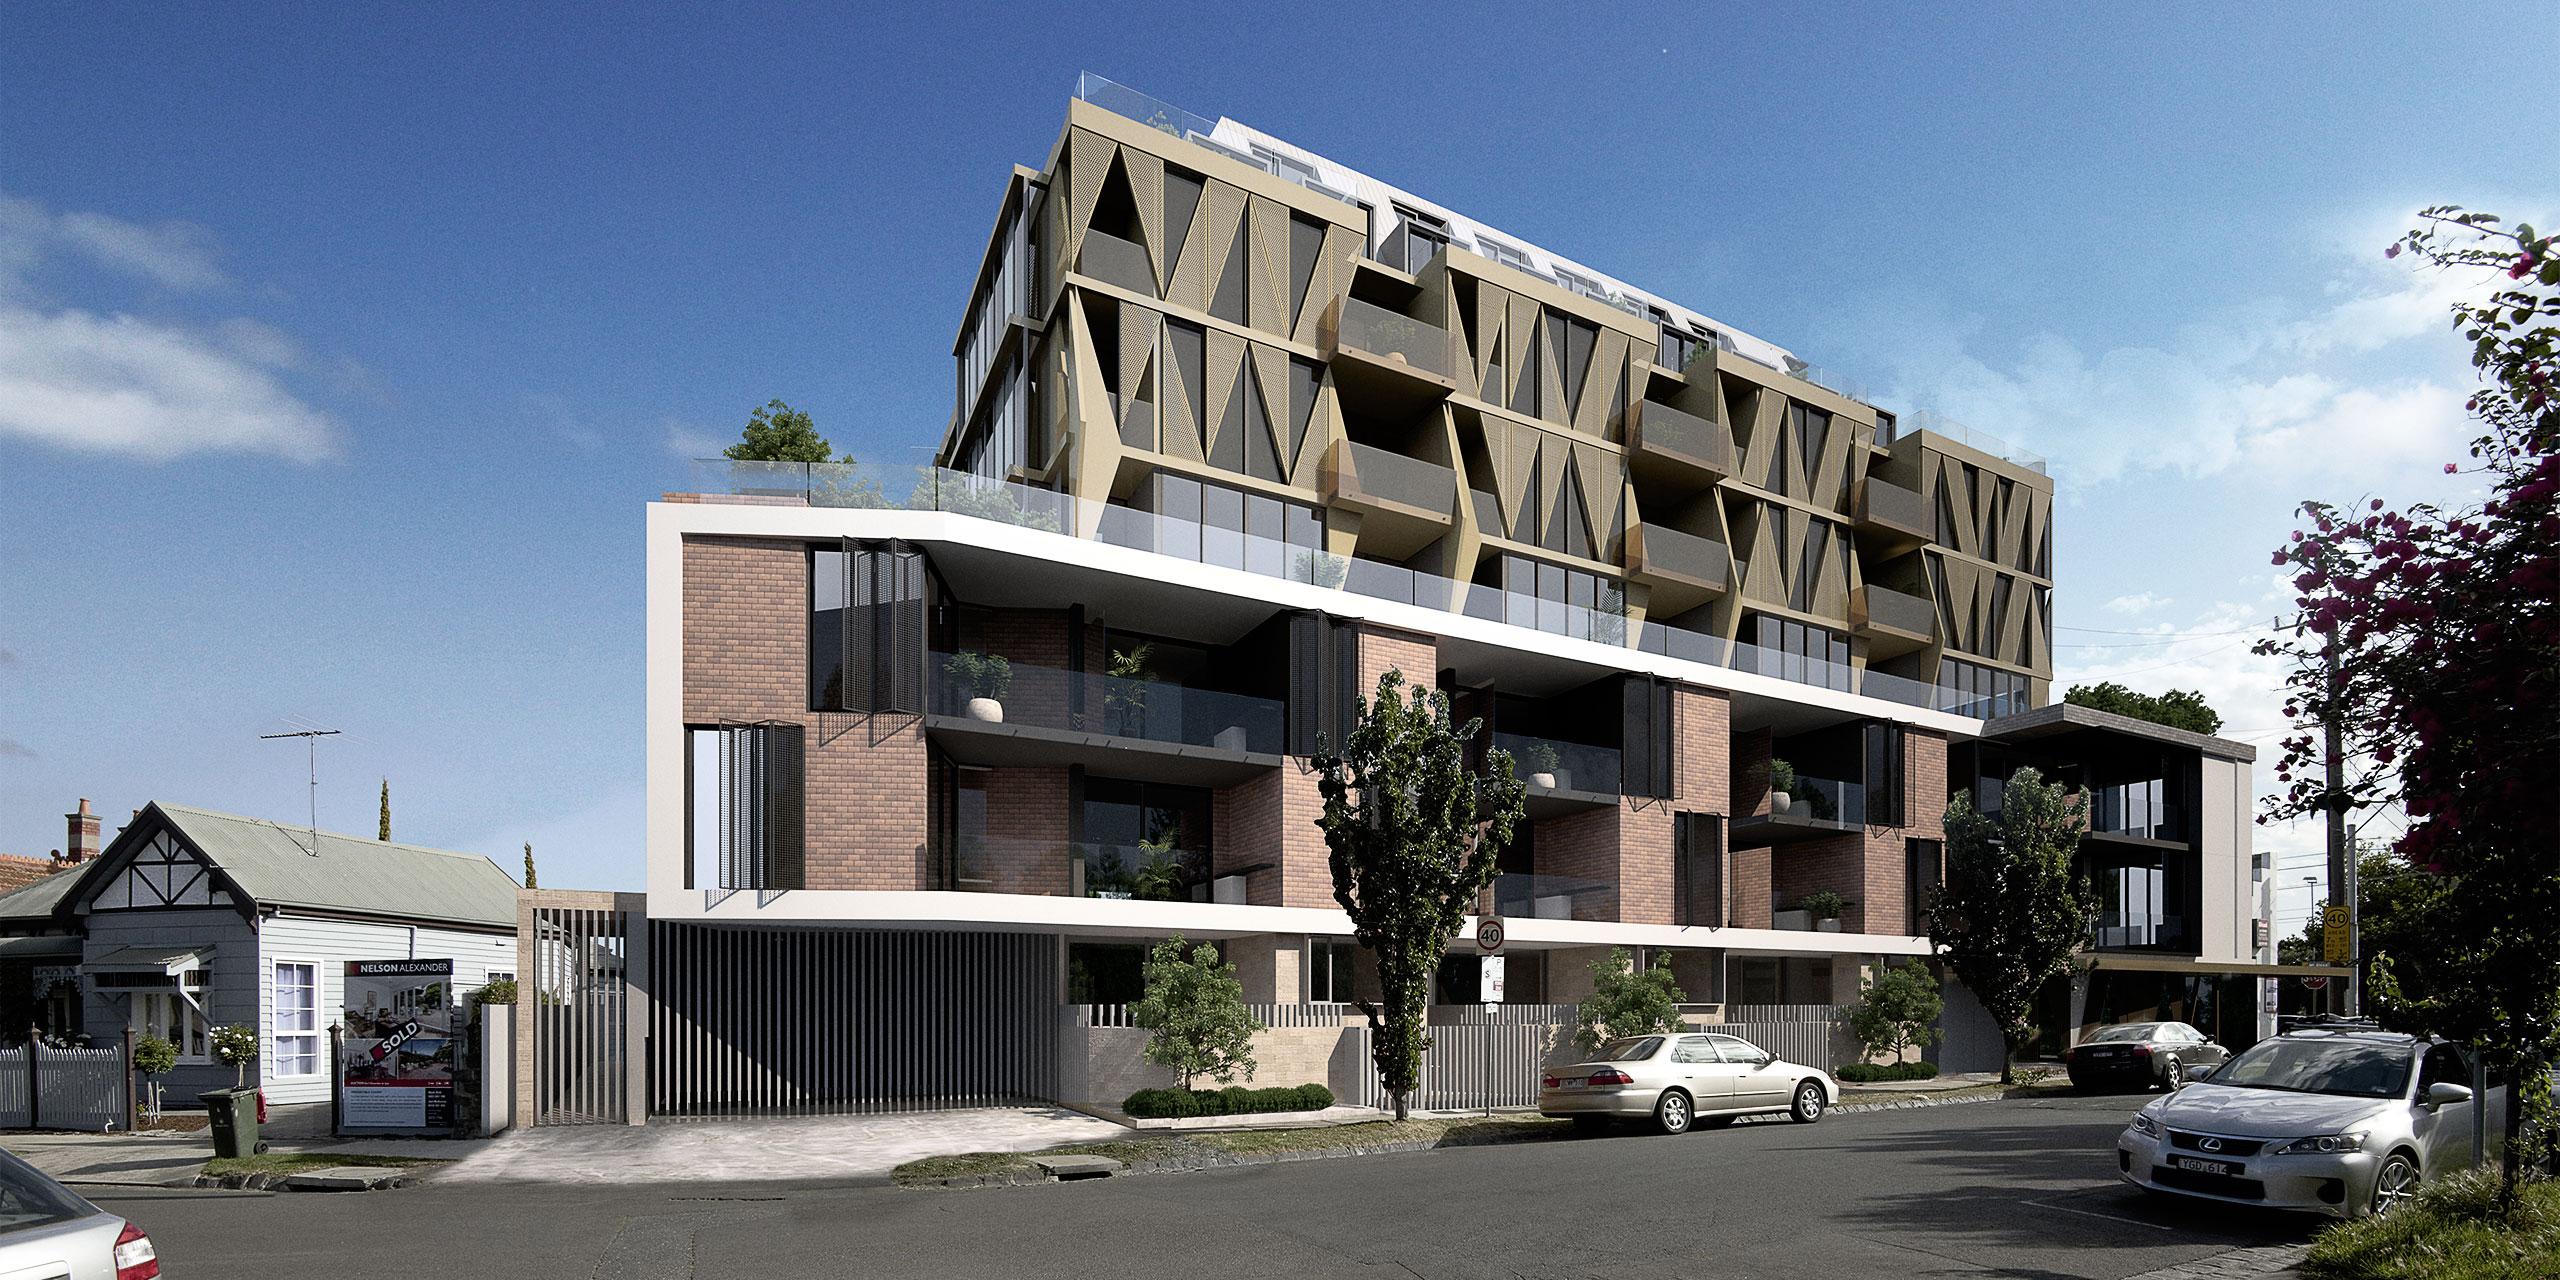 Ascot Vale Apartments